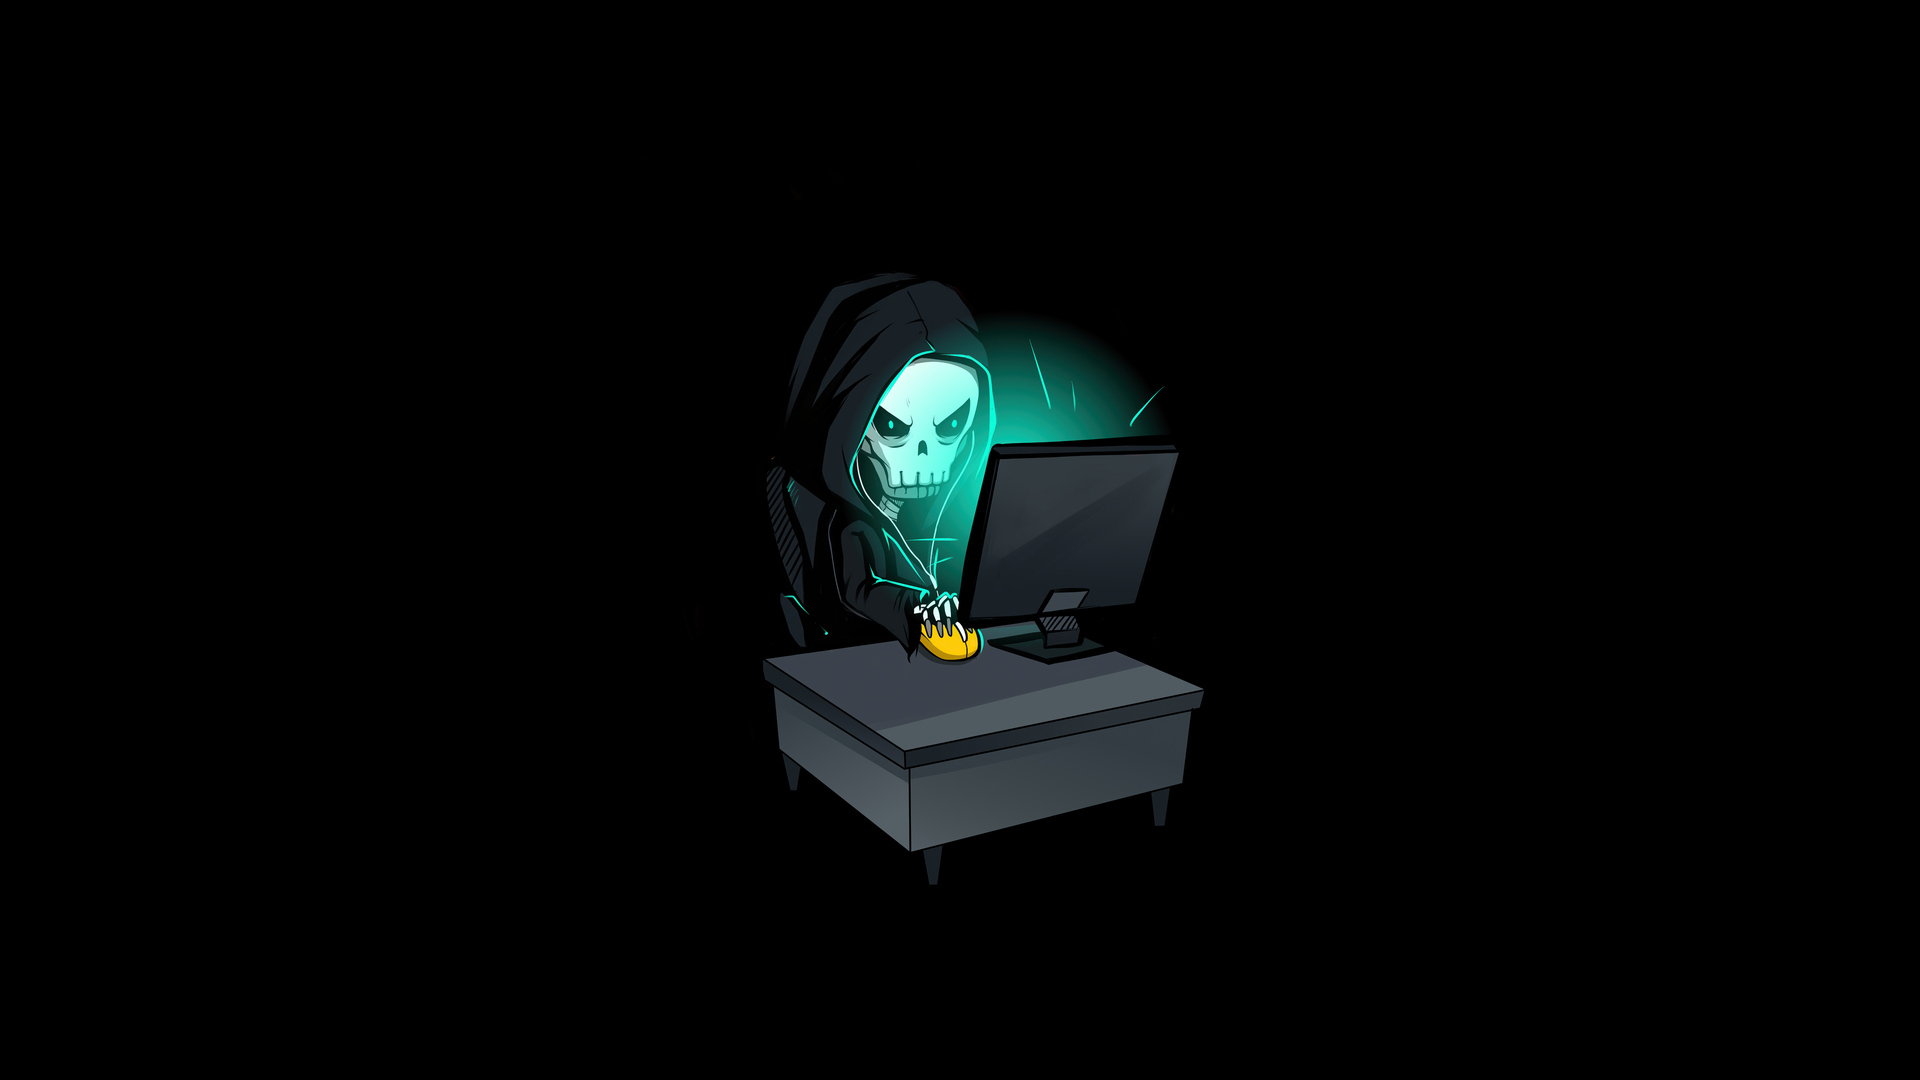 1920x1080 Skull Hacking Time 4k Laptop Full HD 1080P HD 4k ...